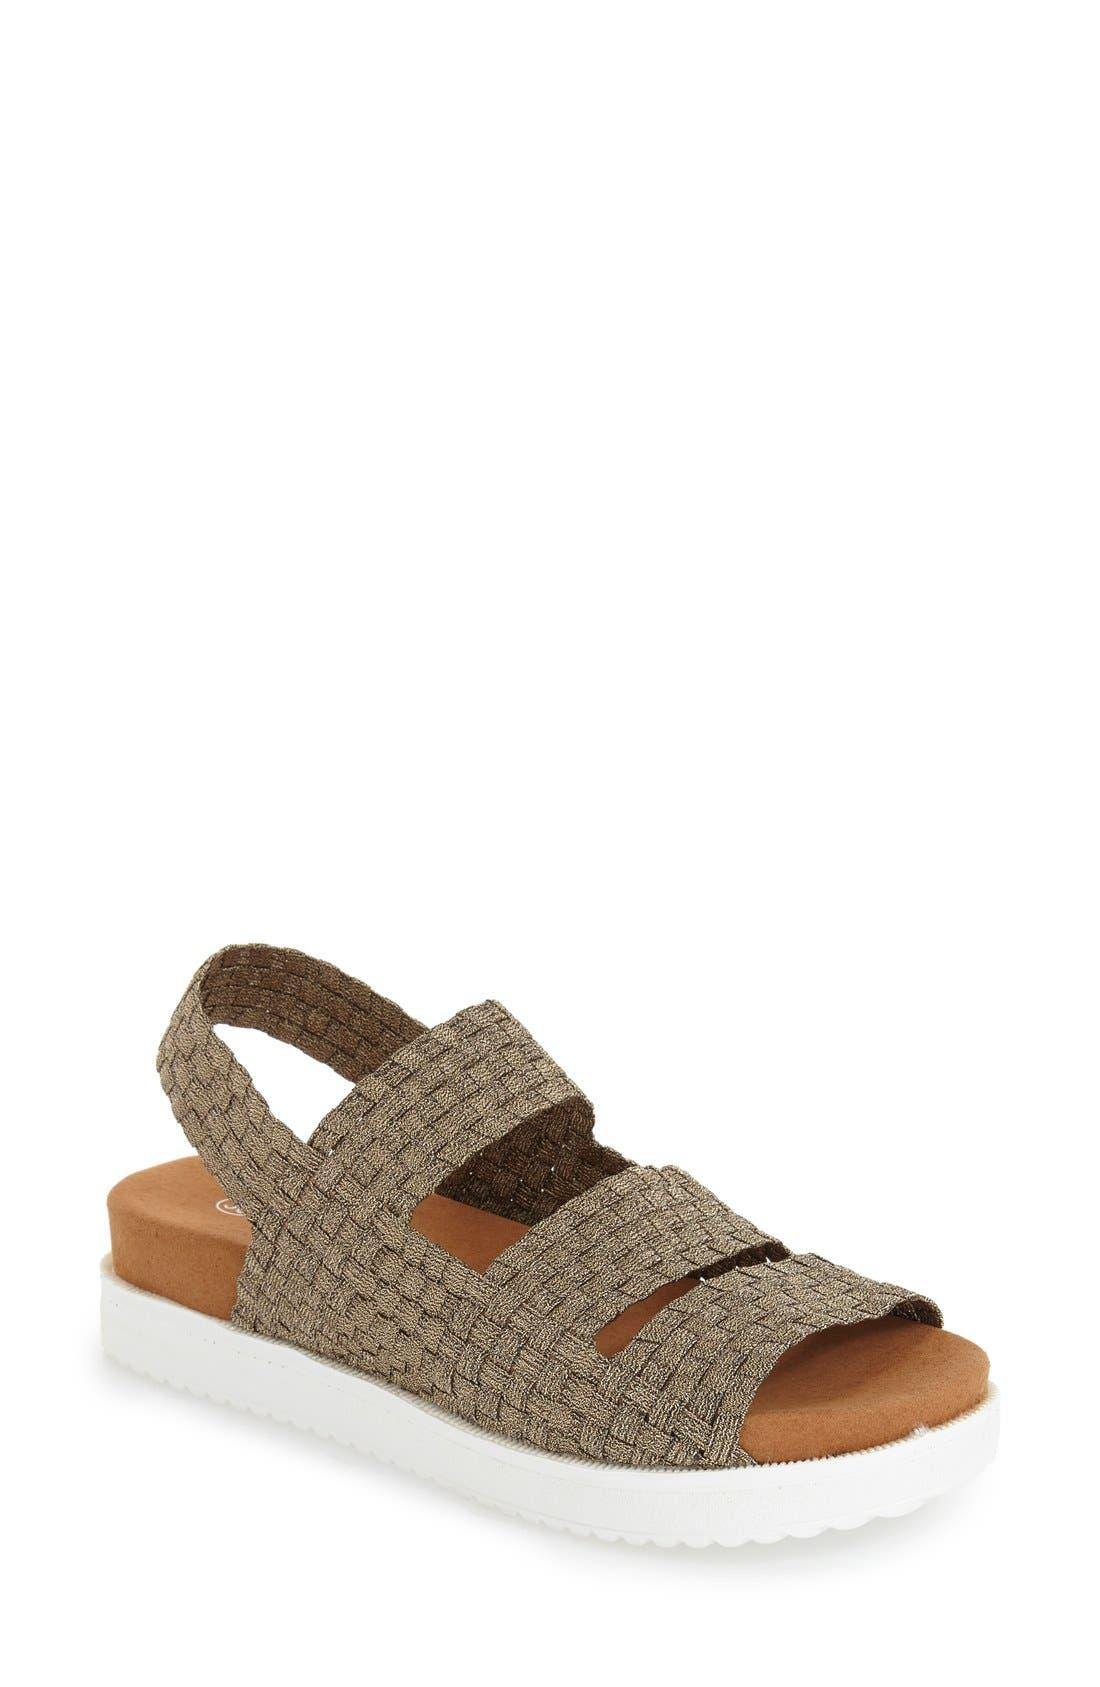 'Crisp' Woven Platform Sandal,                             Main thumbnail 1, color,                             BRONZE FABRIC